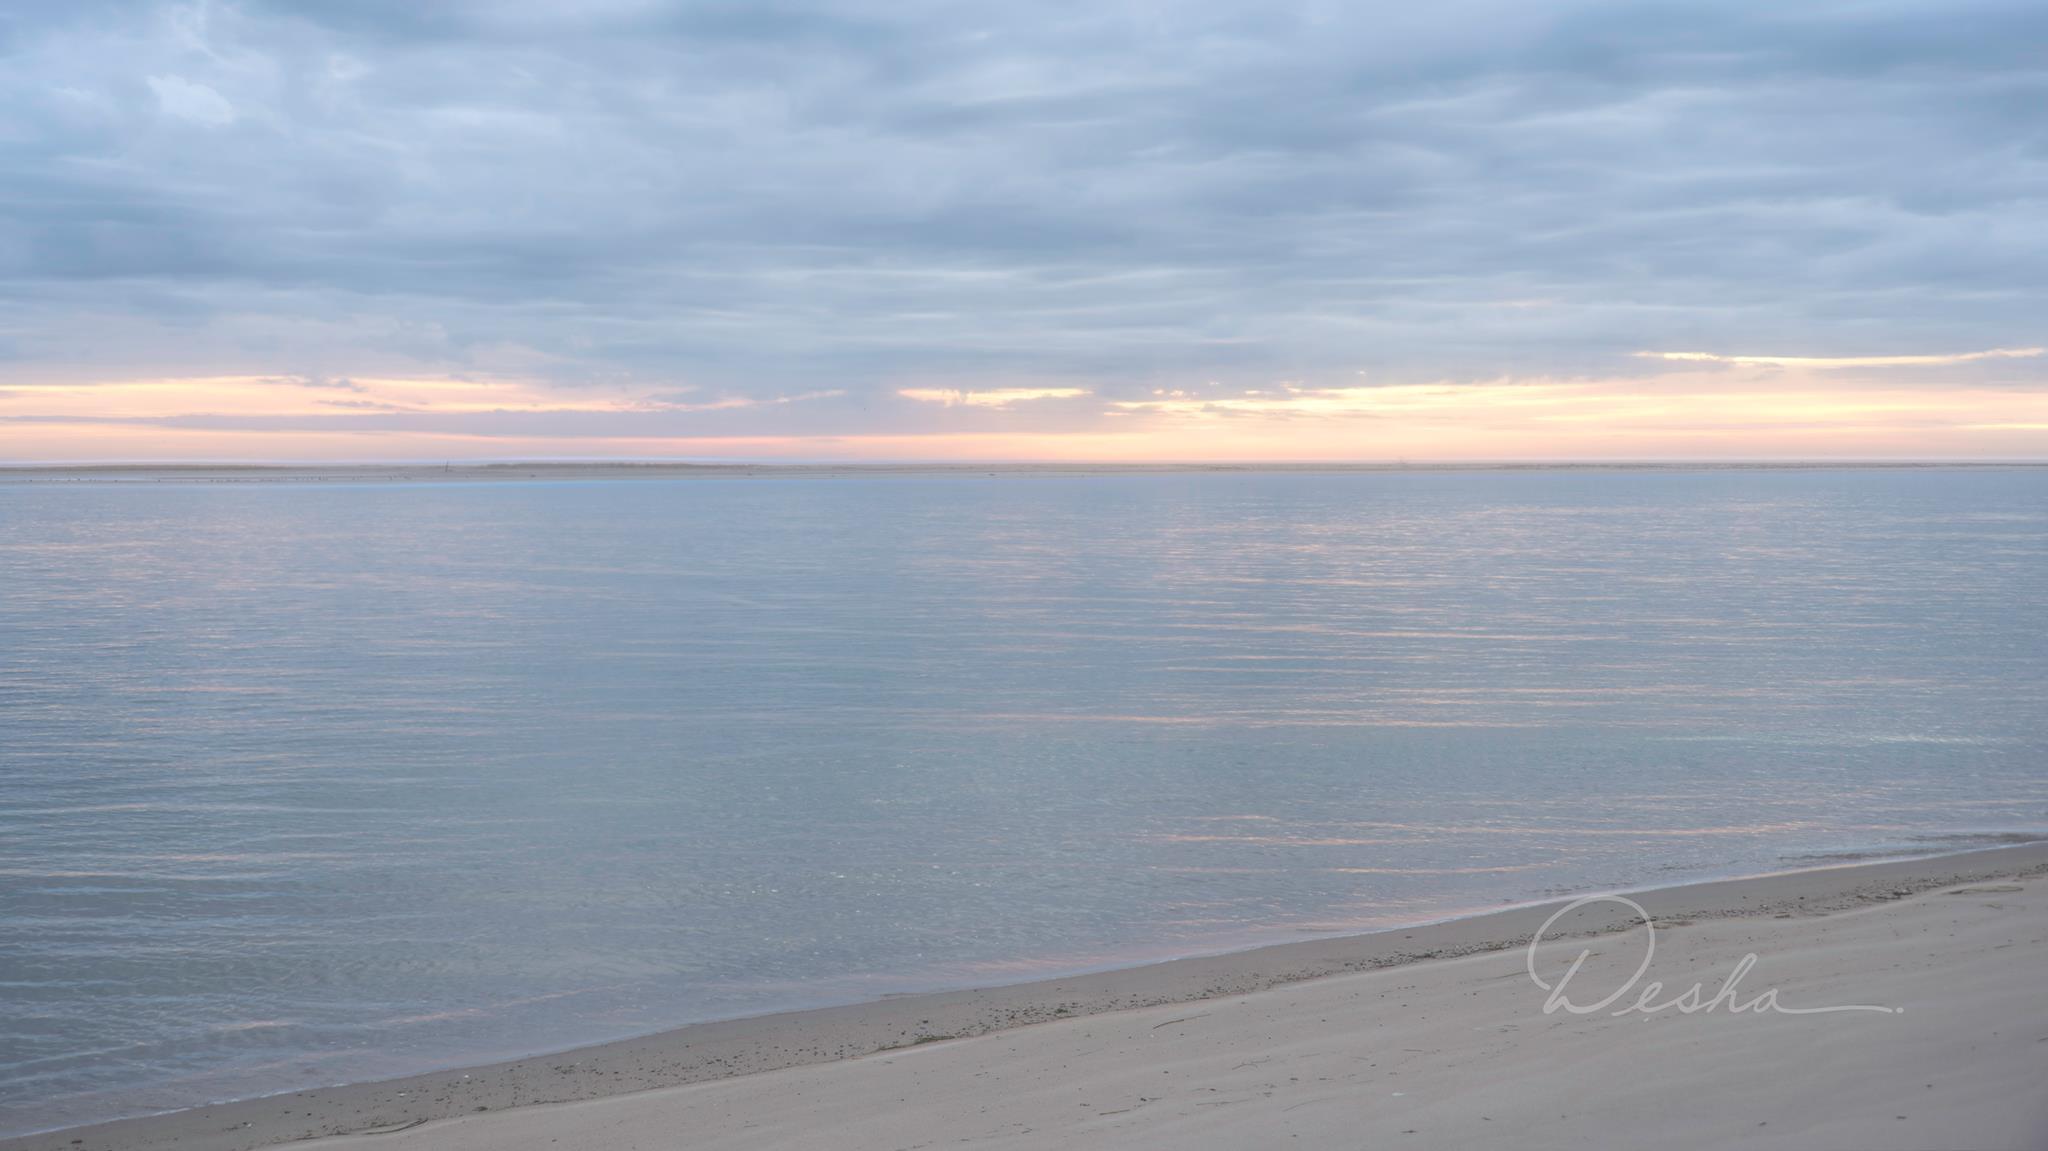 Chatham, MA Sunrise, Cape Cod